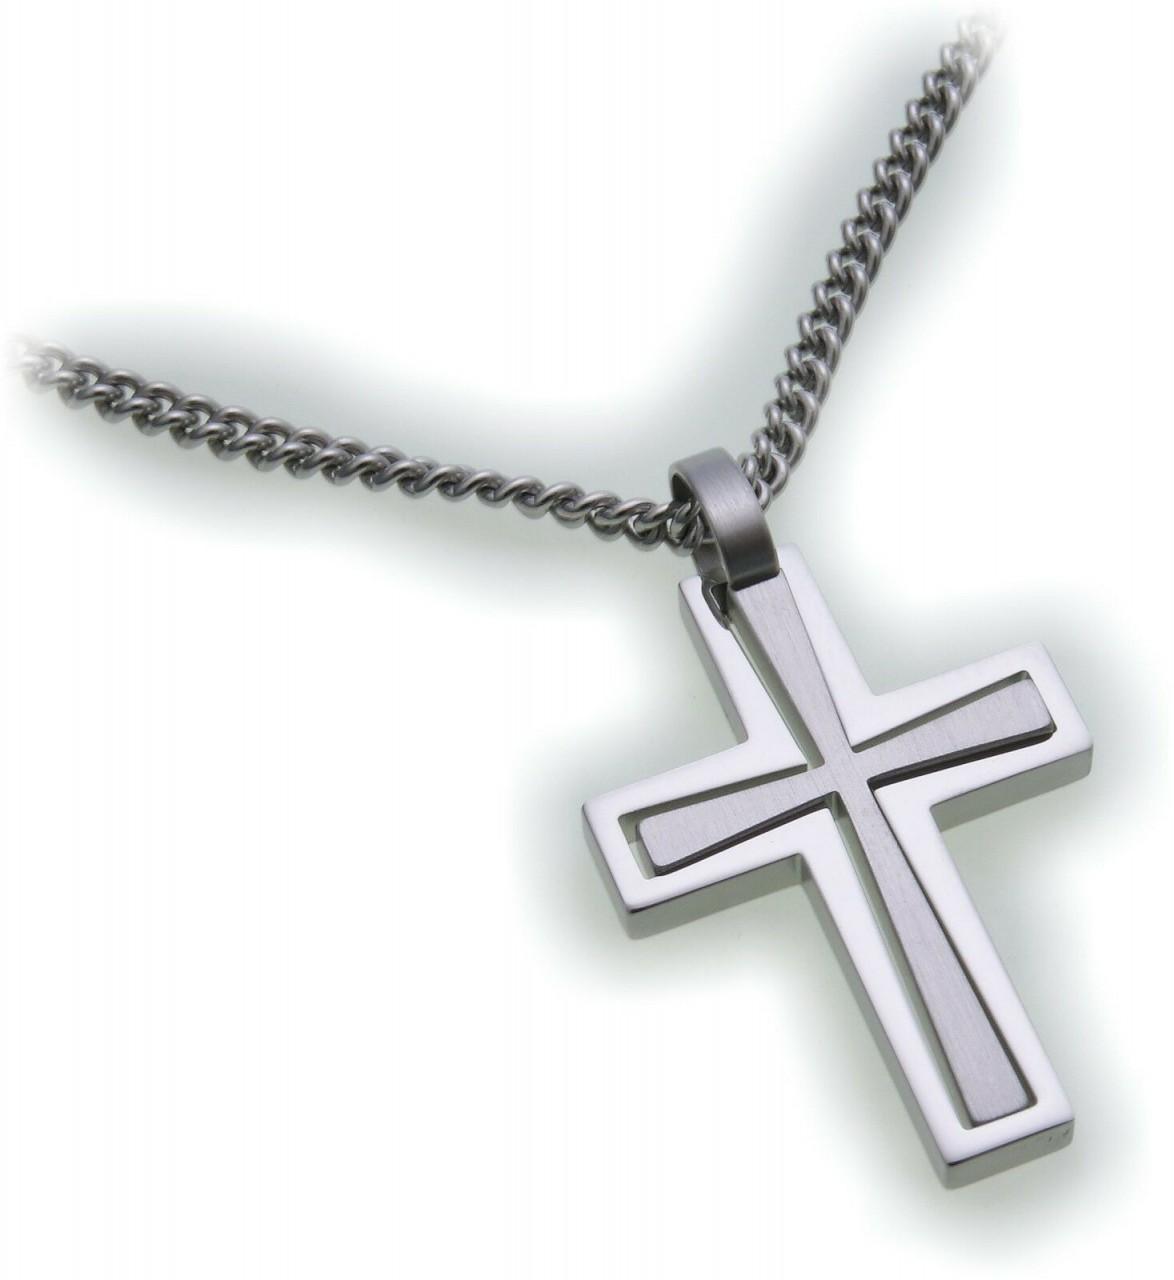 Anhänger Kreuz aus Edelstahl matt und poliert